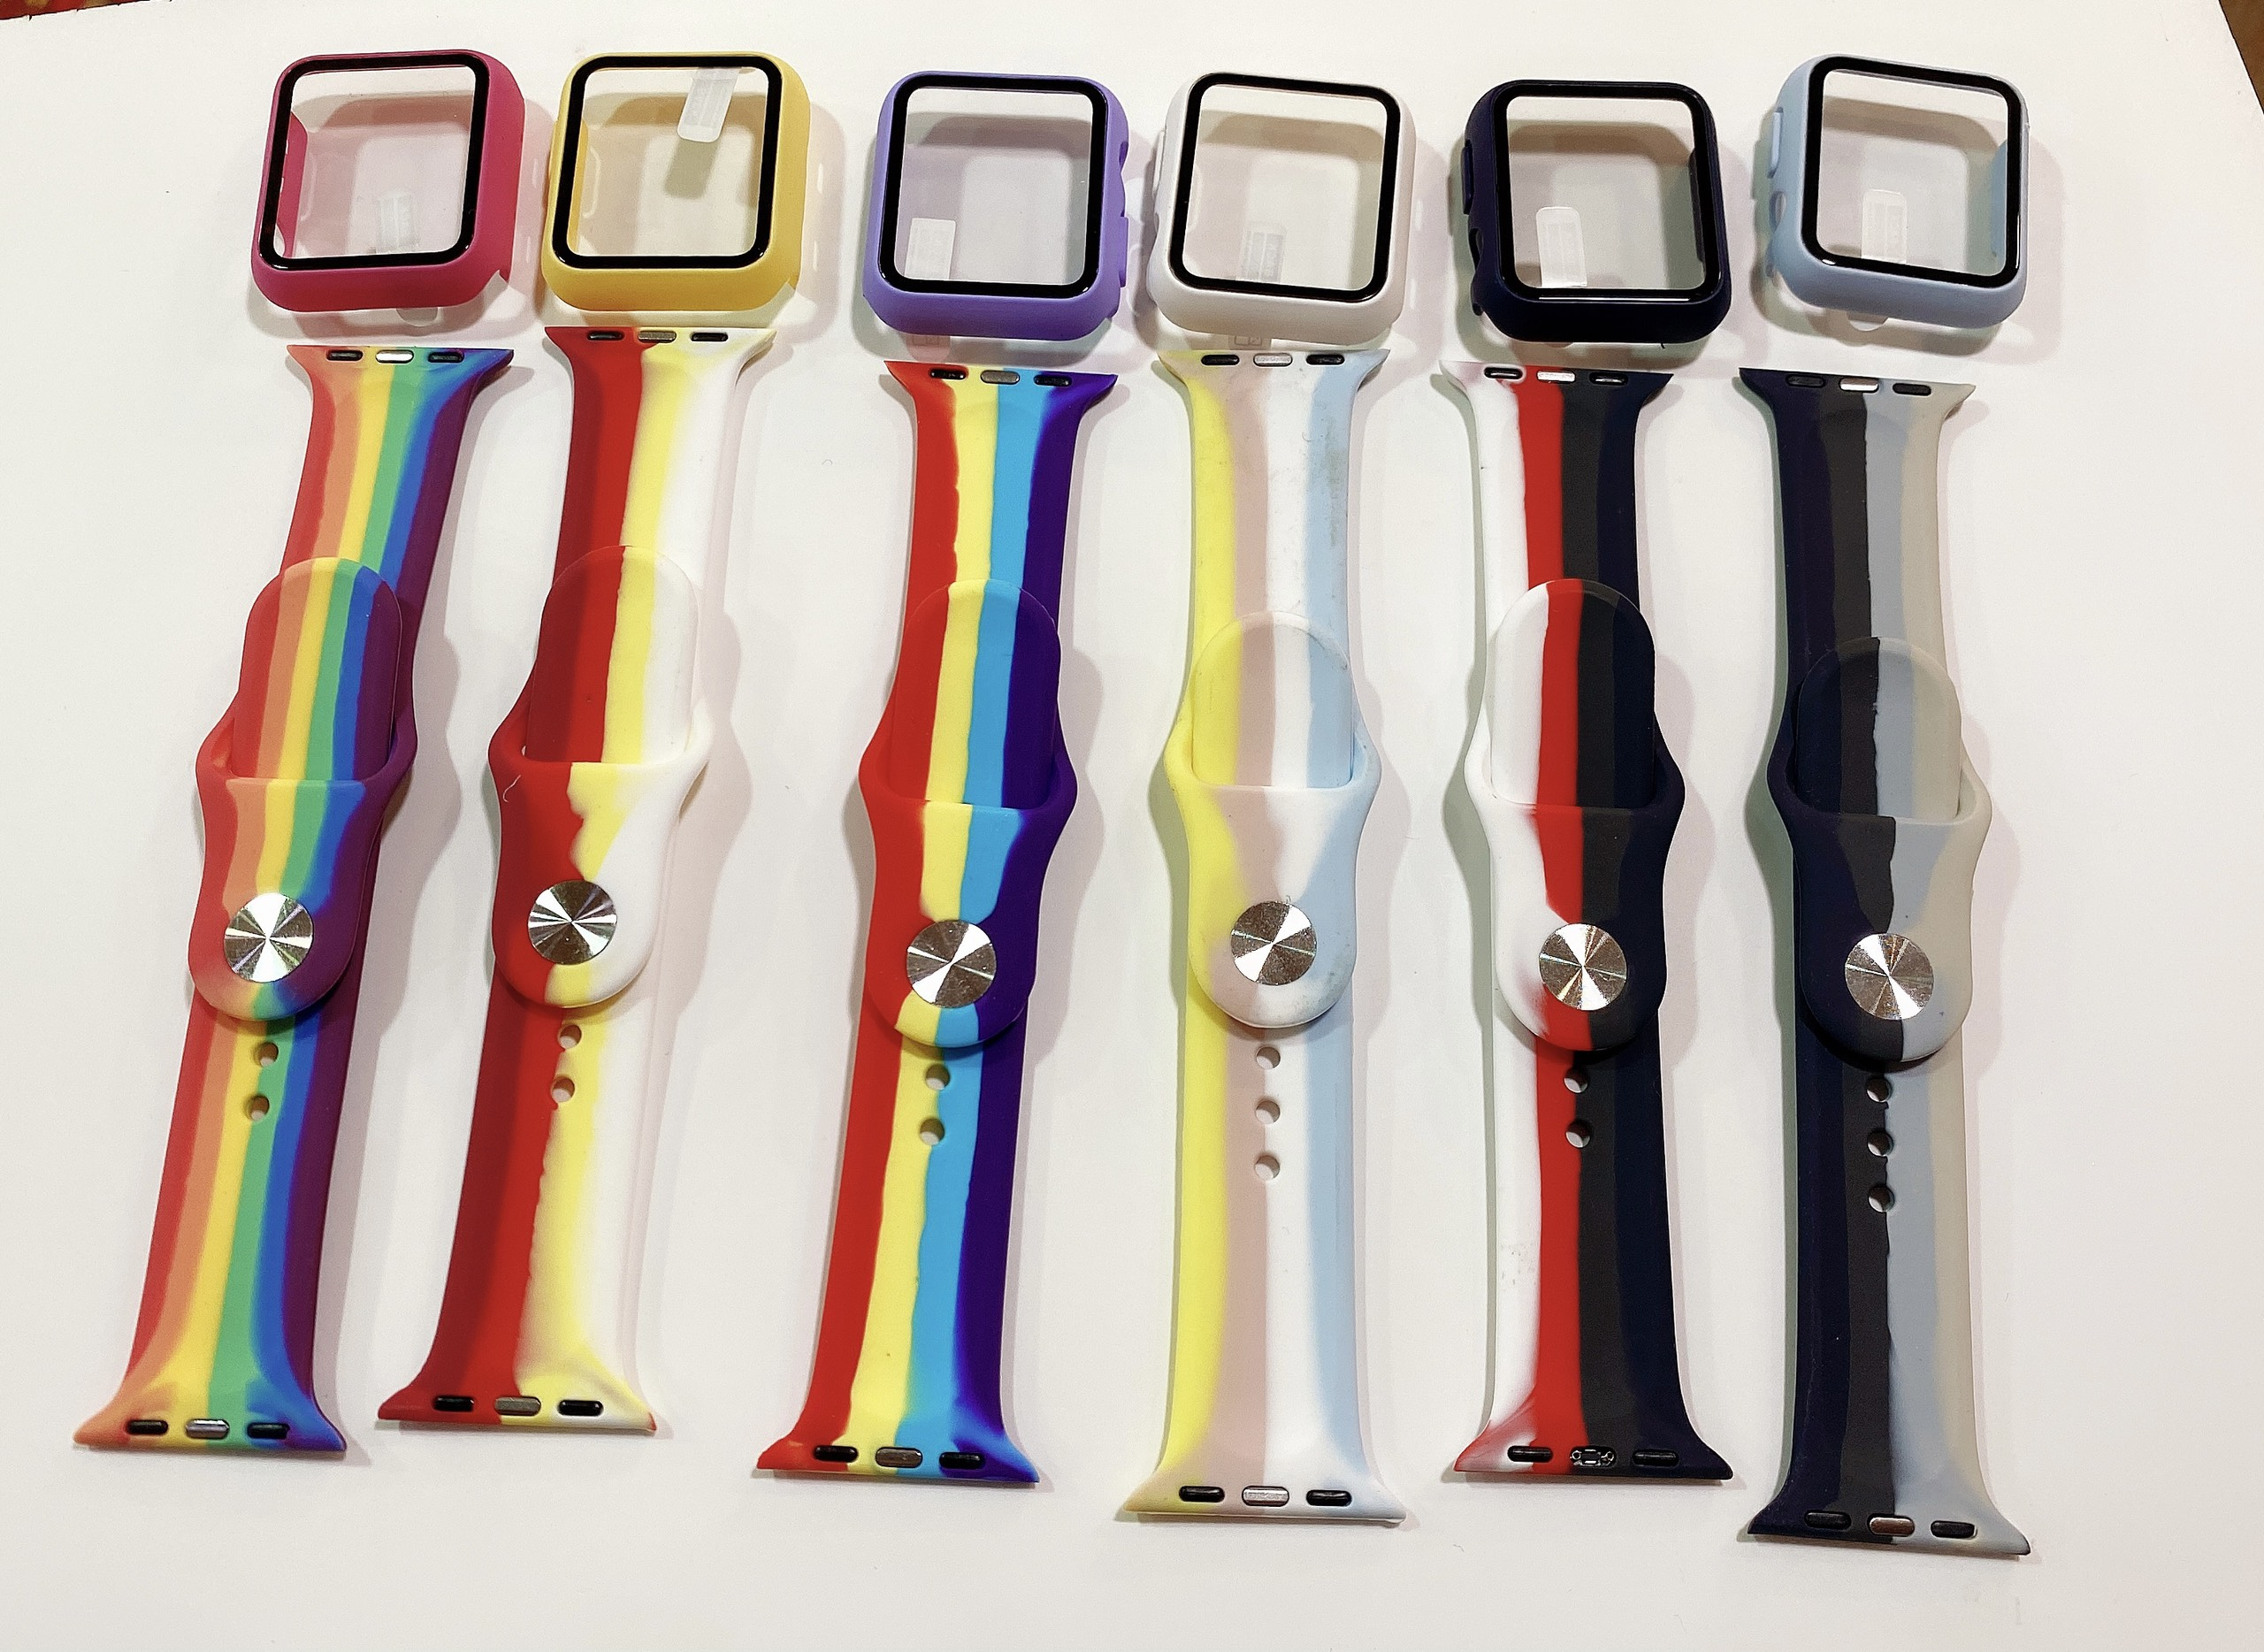 Set Dây Đeo Apple Watch Cầu Vồng